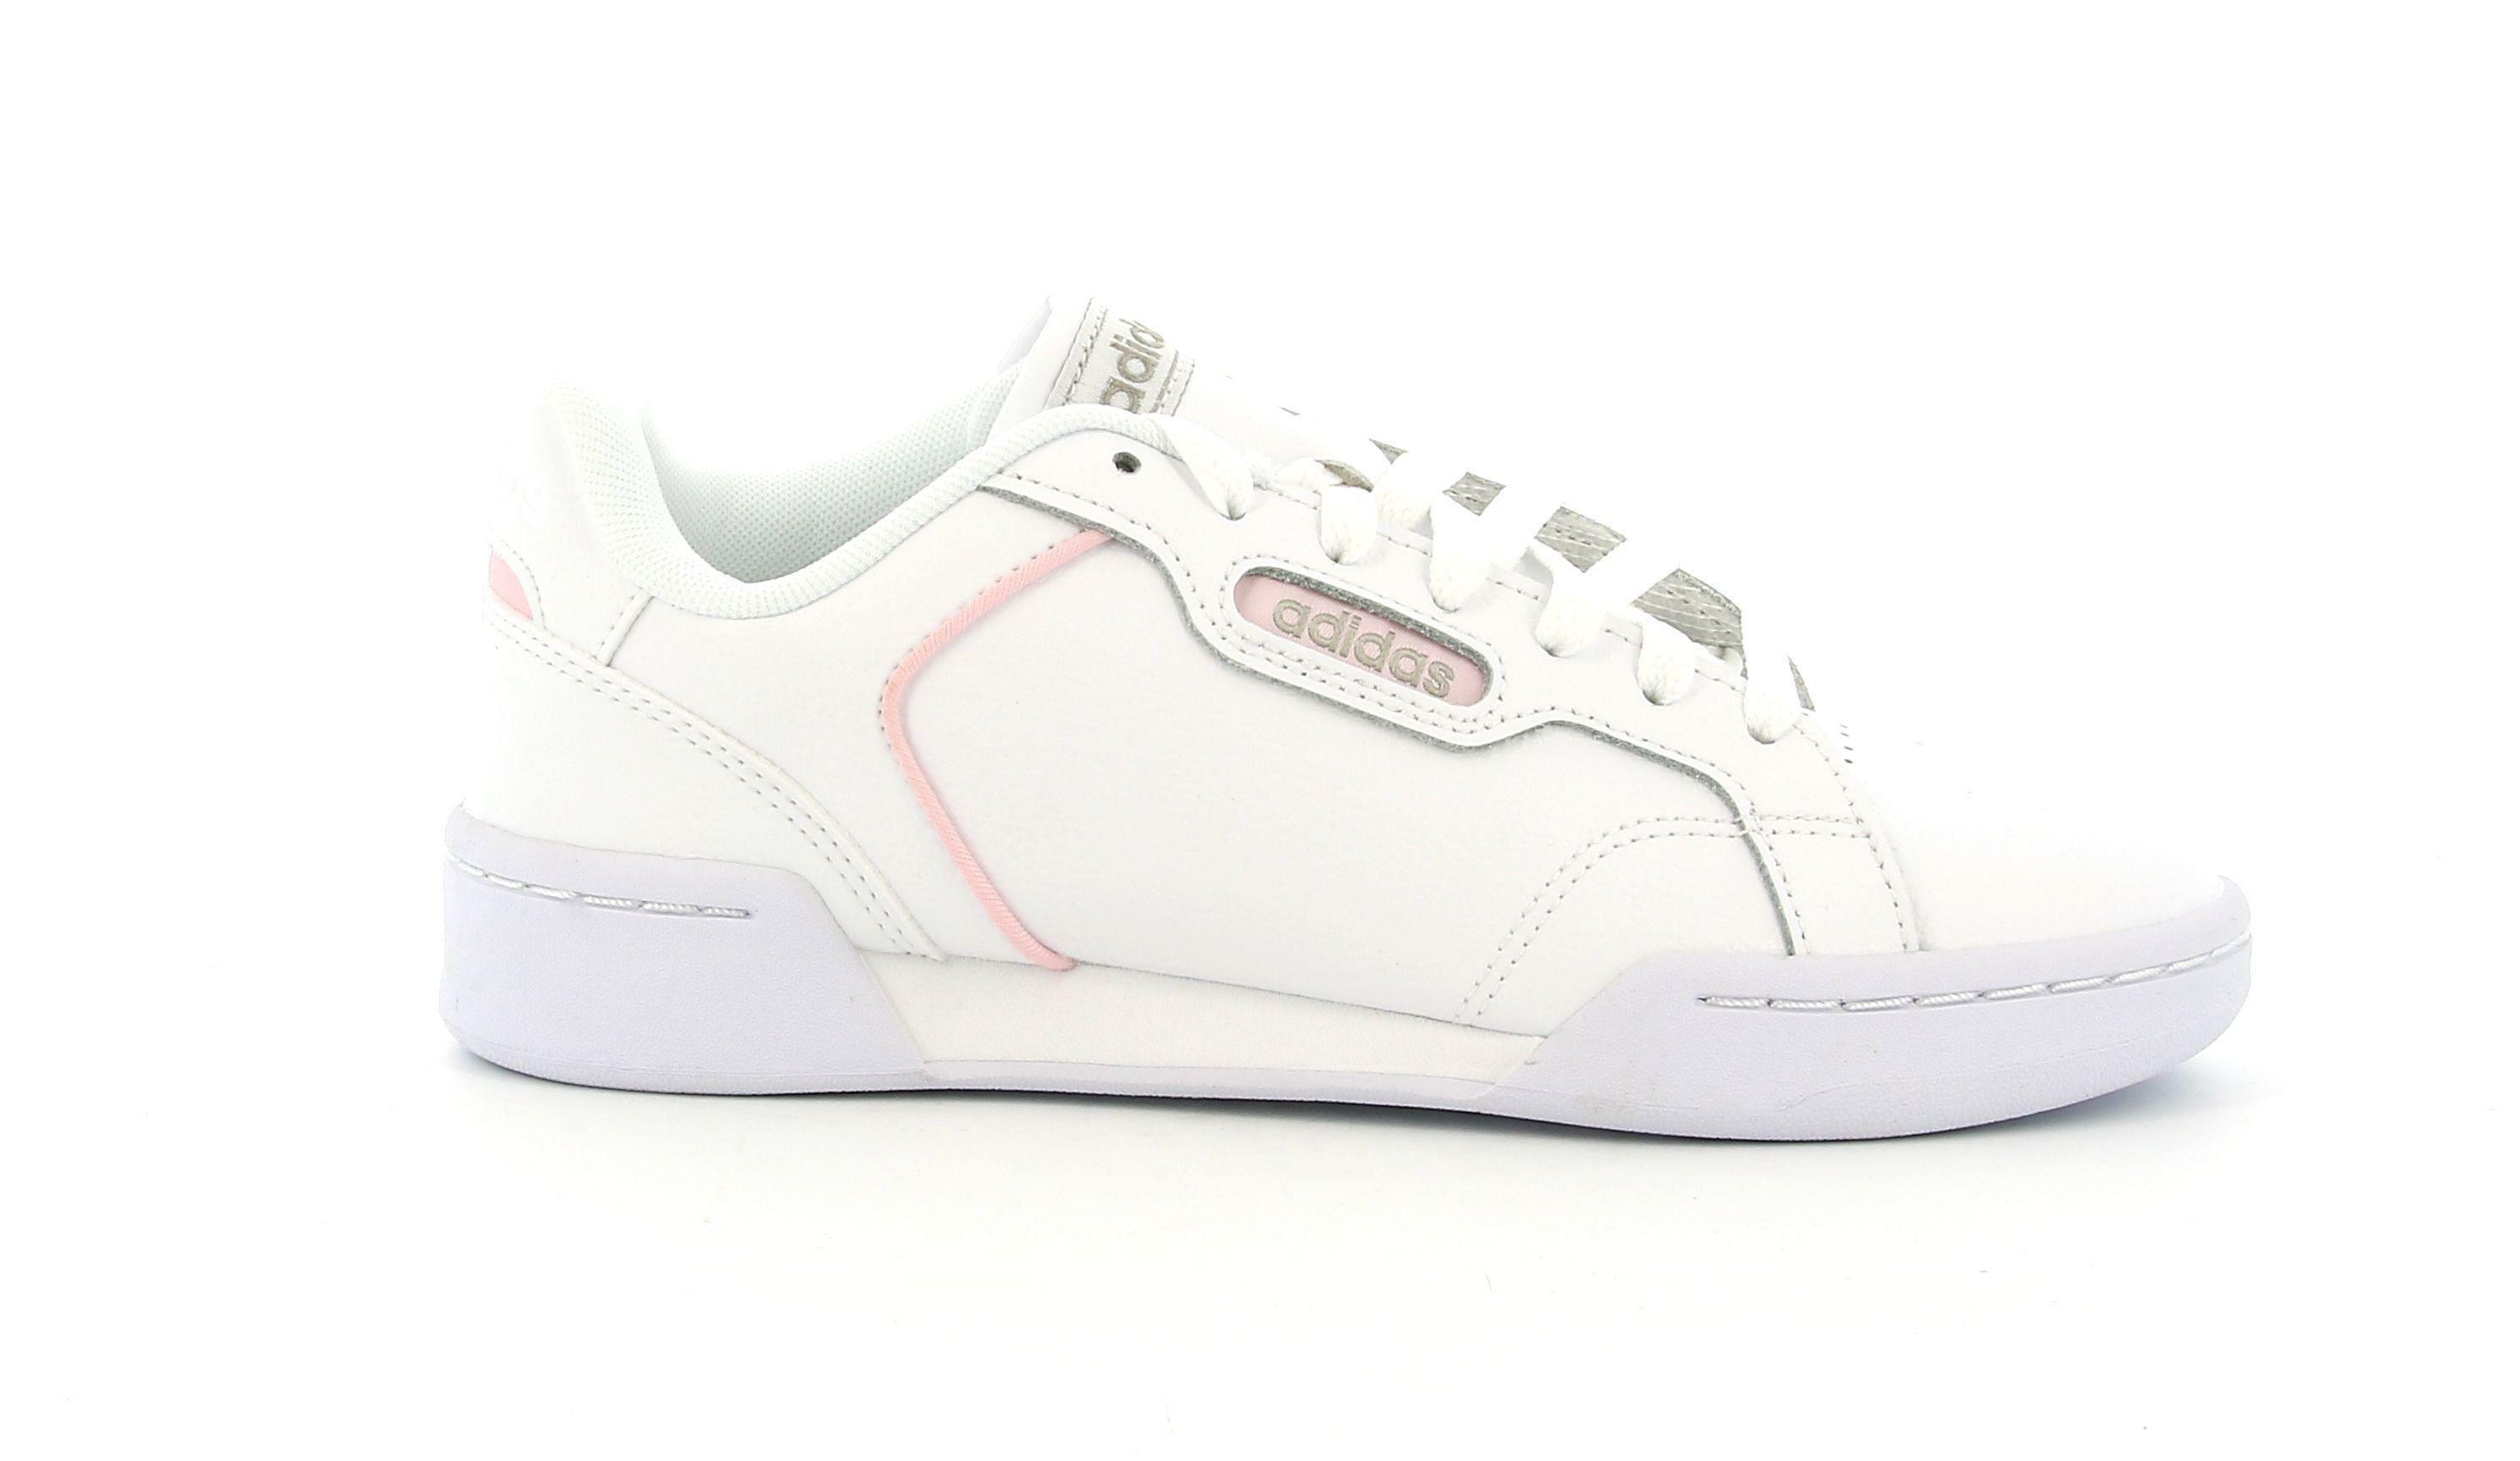 adidas adidas roguera scarpe da cross training donna eg2662